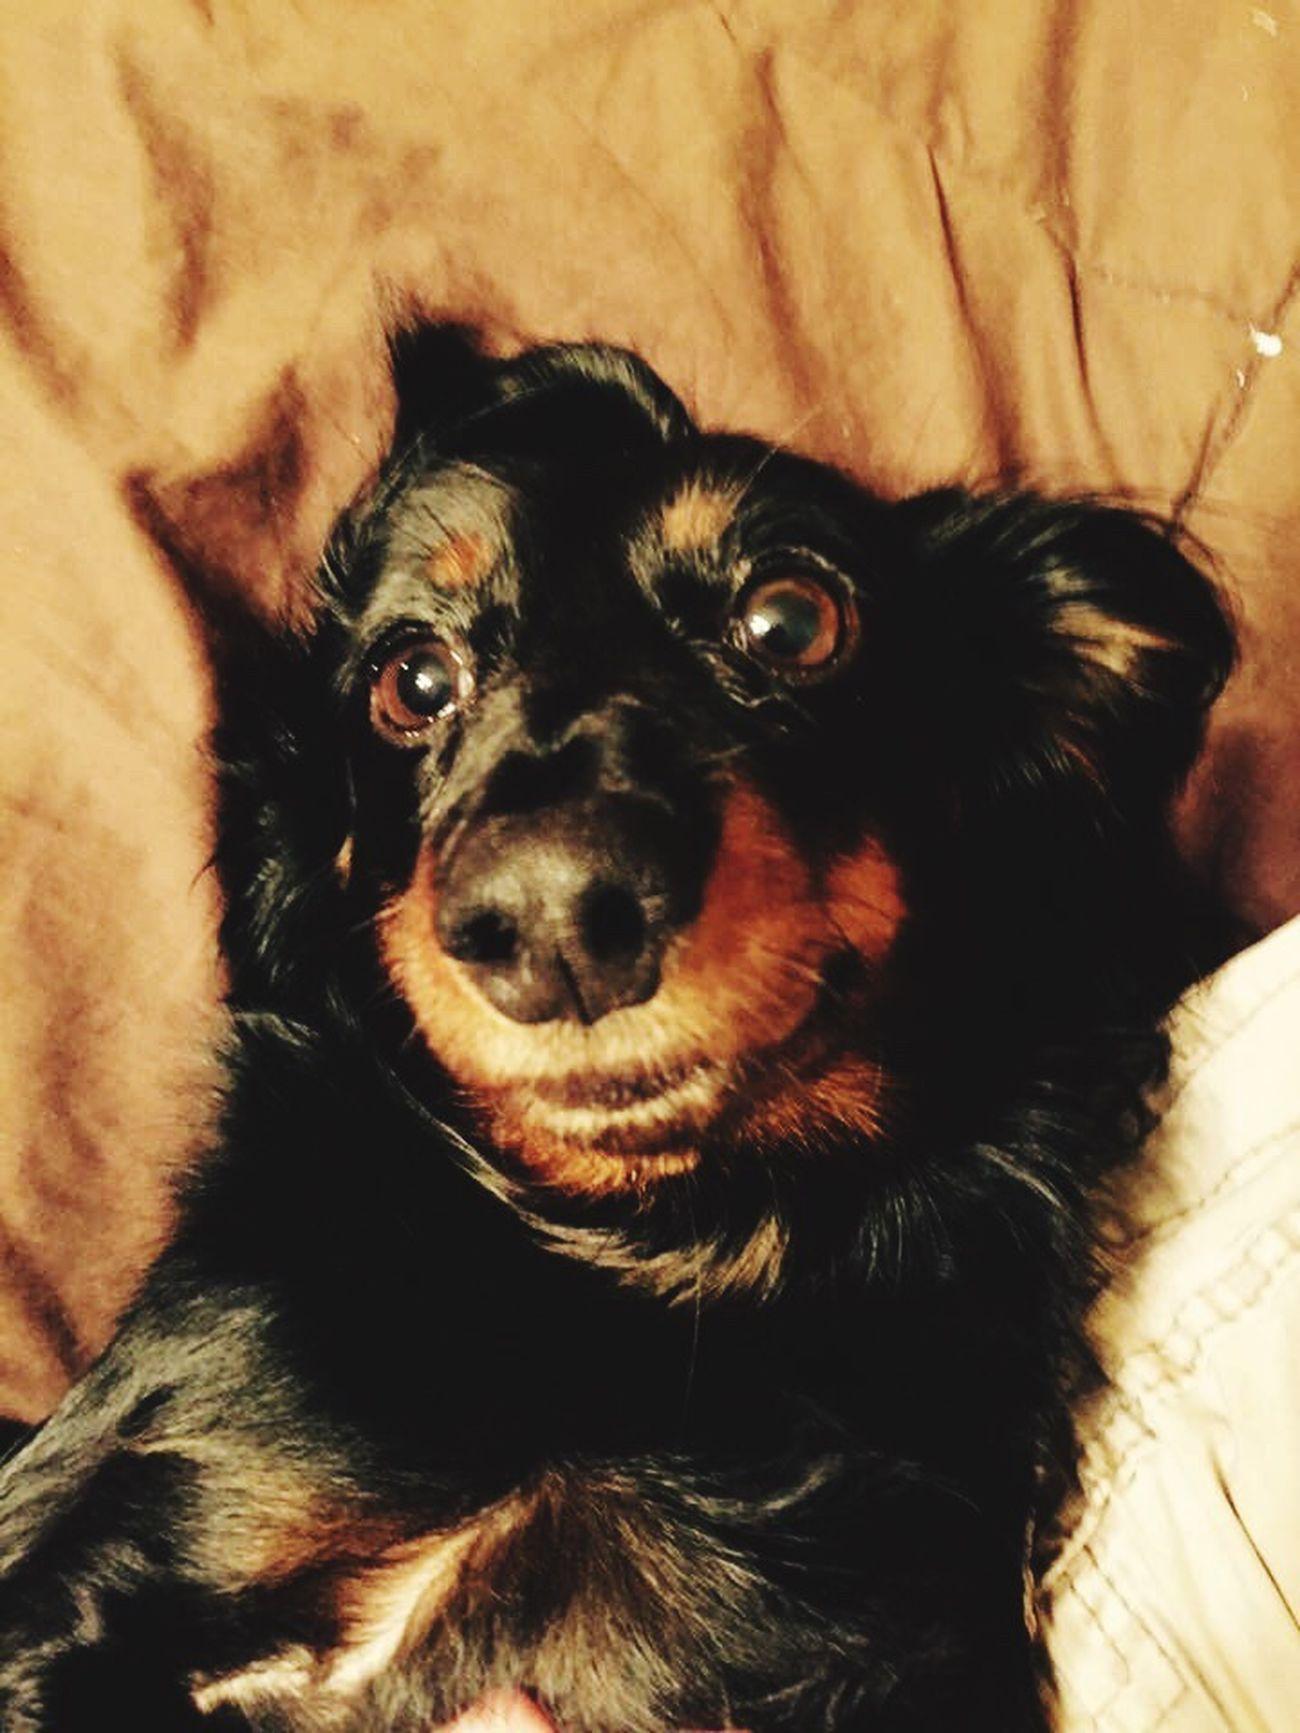 Weiner-Dog HotDog Pets Close-up Pampered Pets Loyalty